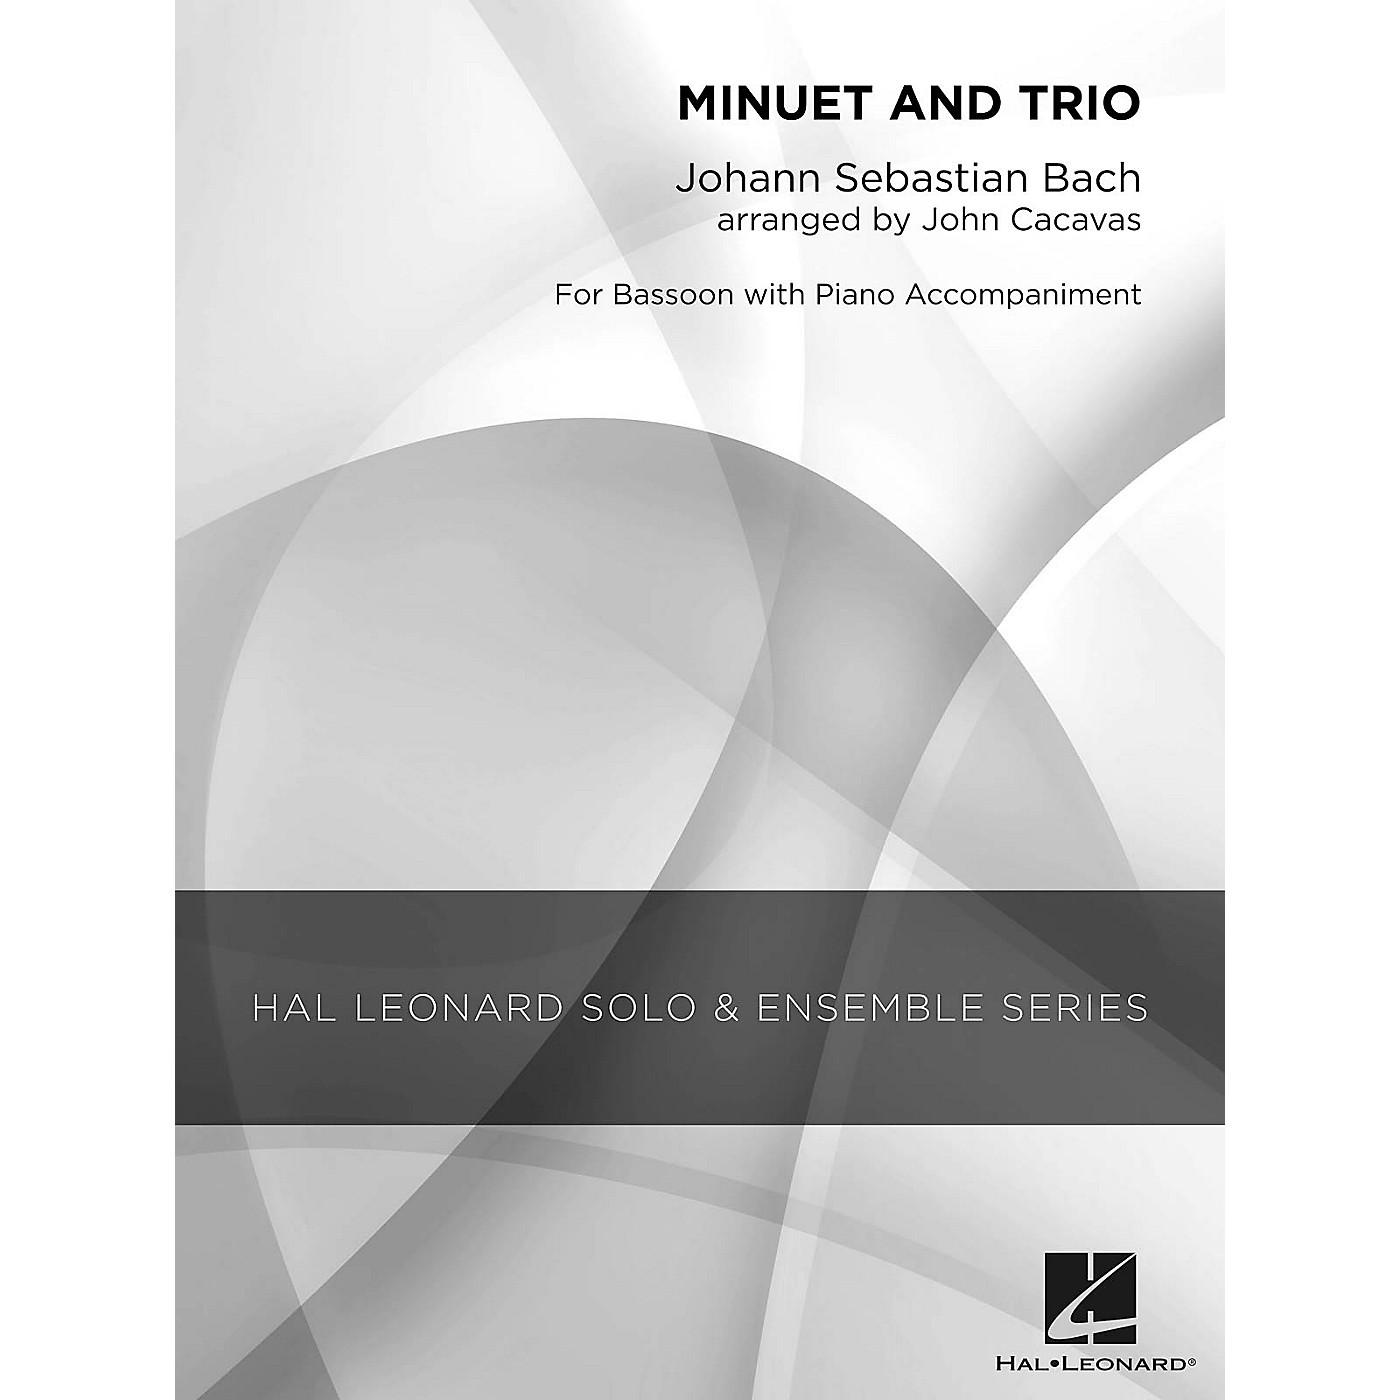 Hal Leonard Minuet and Trio (Grade 2.5 Bassoon Solo) Concert Band Level 2.5 Arranged by John Cacavas thumbnail